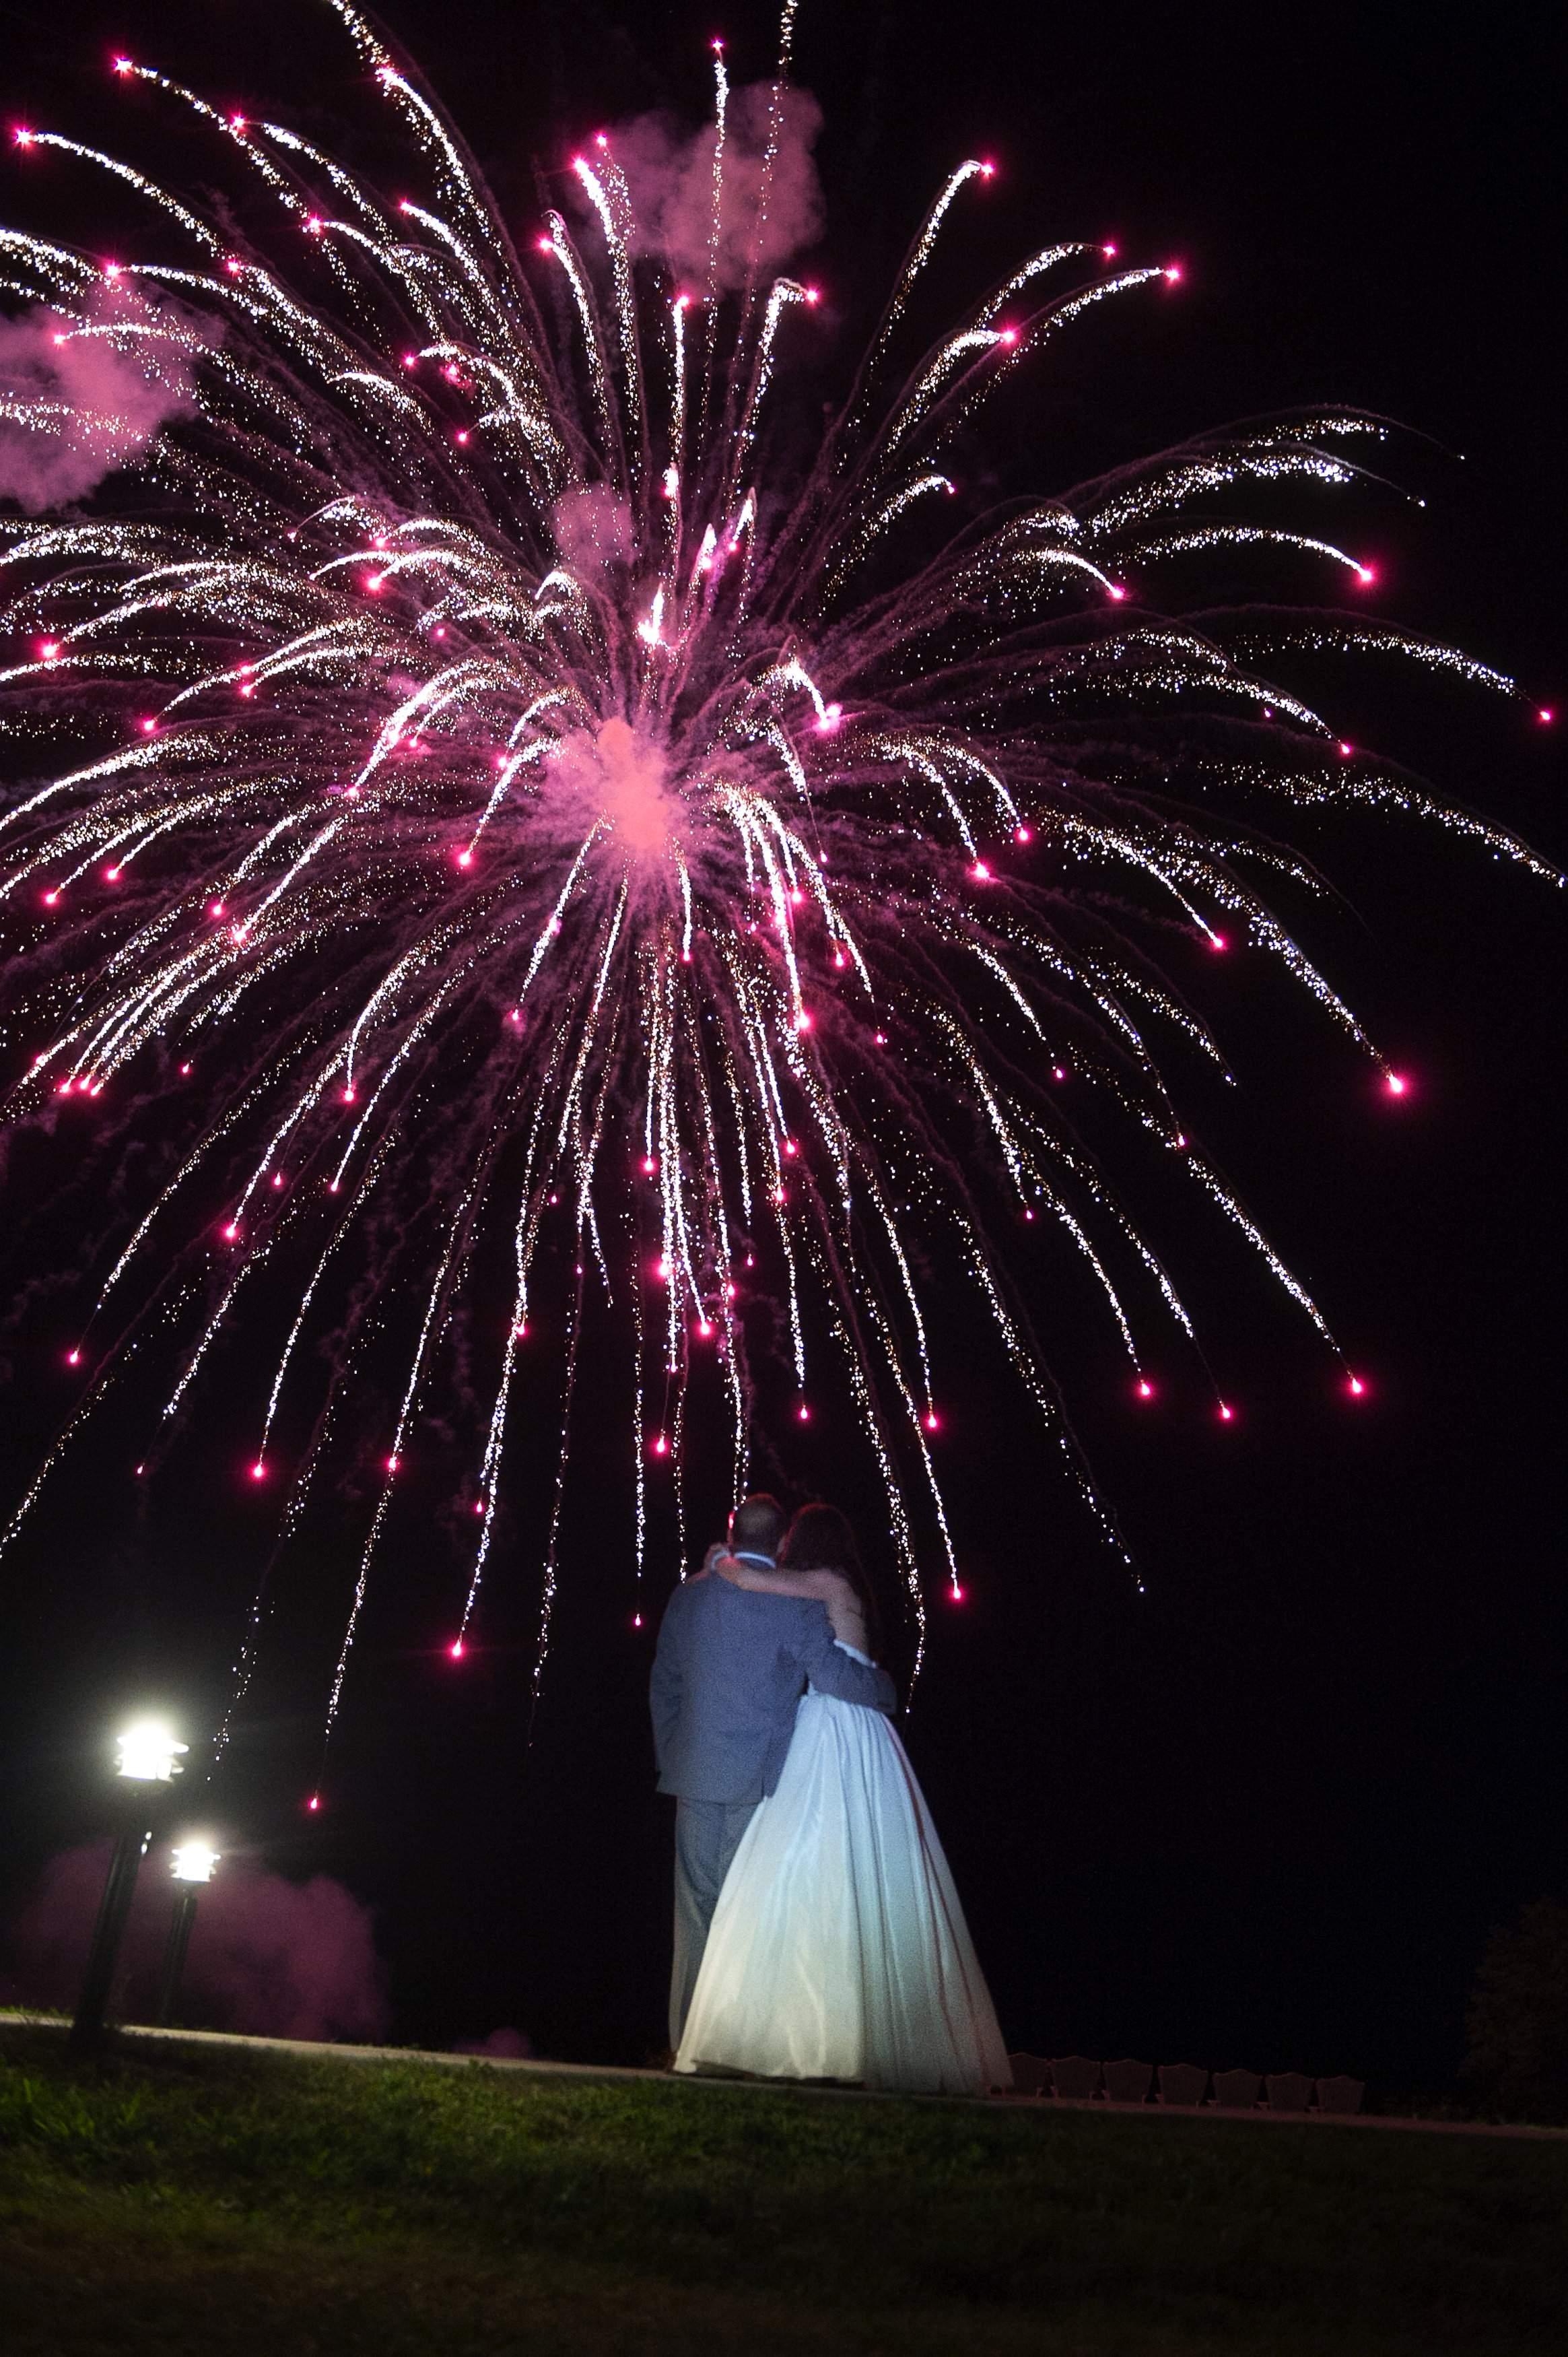 Fireworks at Wedding - Tent Reception - French's Point in Midcoast Maine - Coastal Maine Wedding Venue - Oceanside Destination